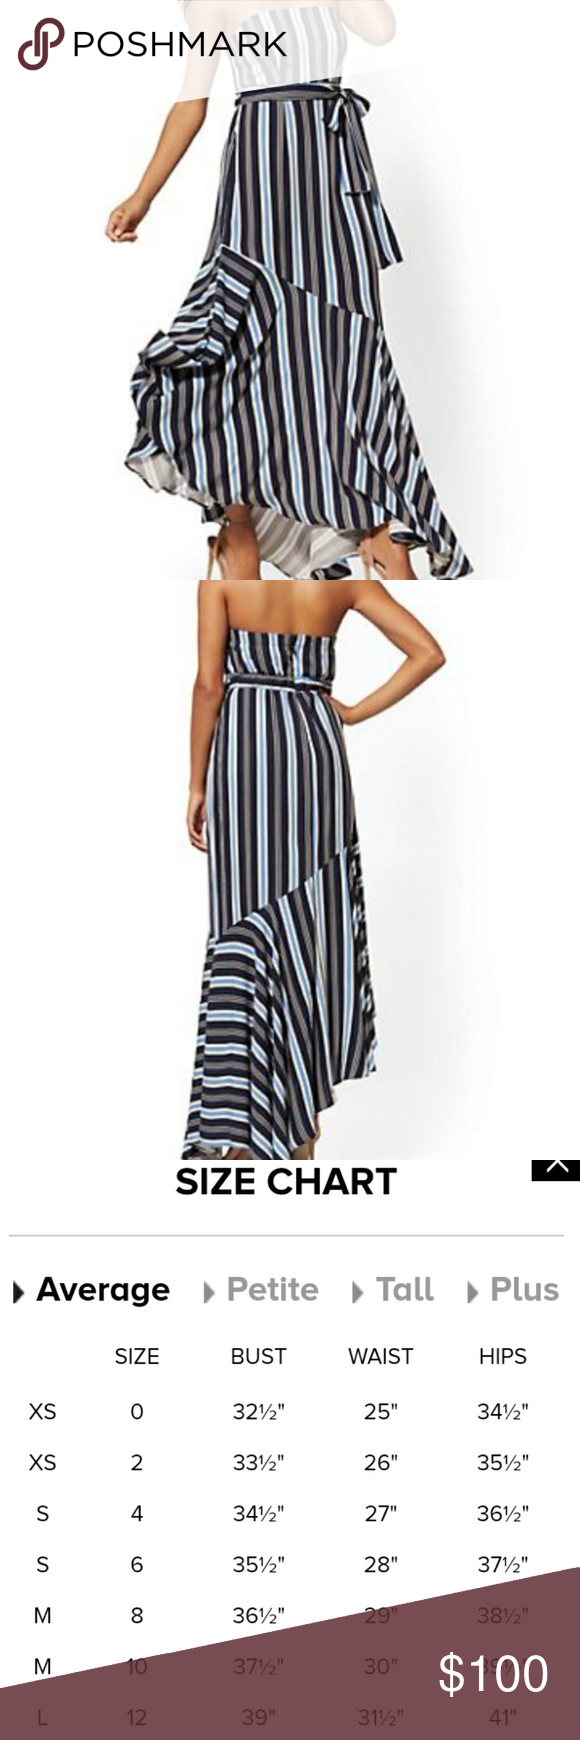 Sale Ny Co Stripe Maxi Dress Maxi Dress Blue Strapless Maxi Dress Striped Maxi Dresses [ 1740 x 580 Pixel ]